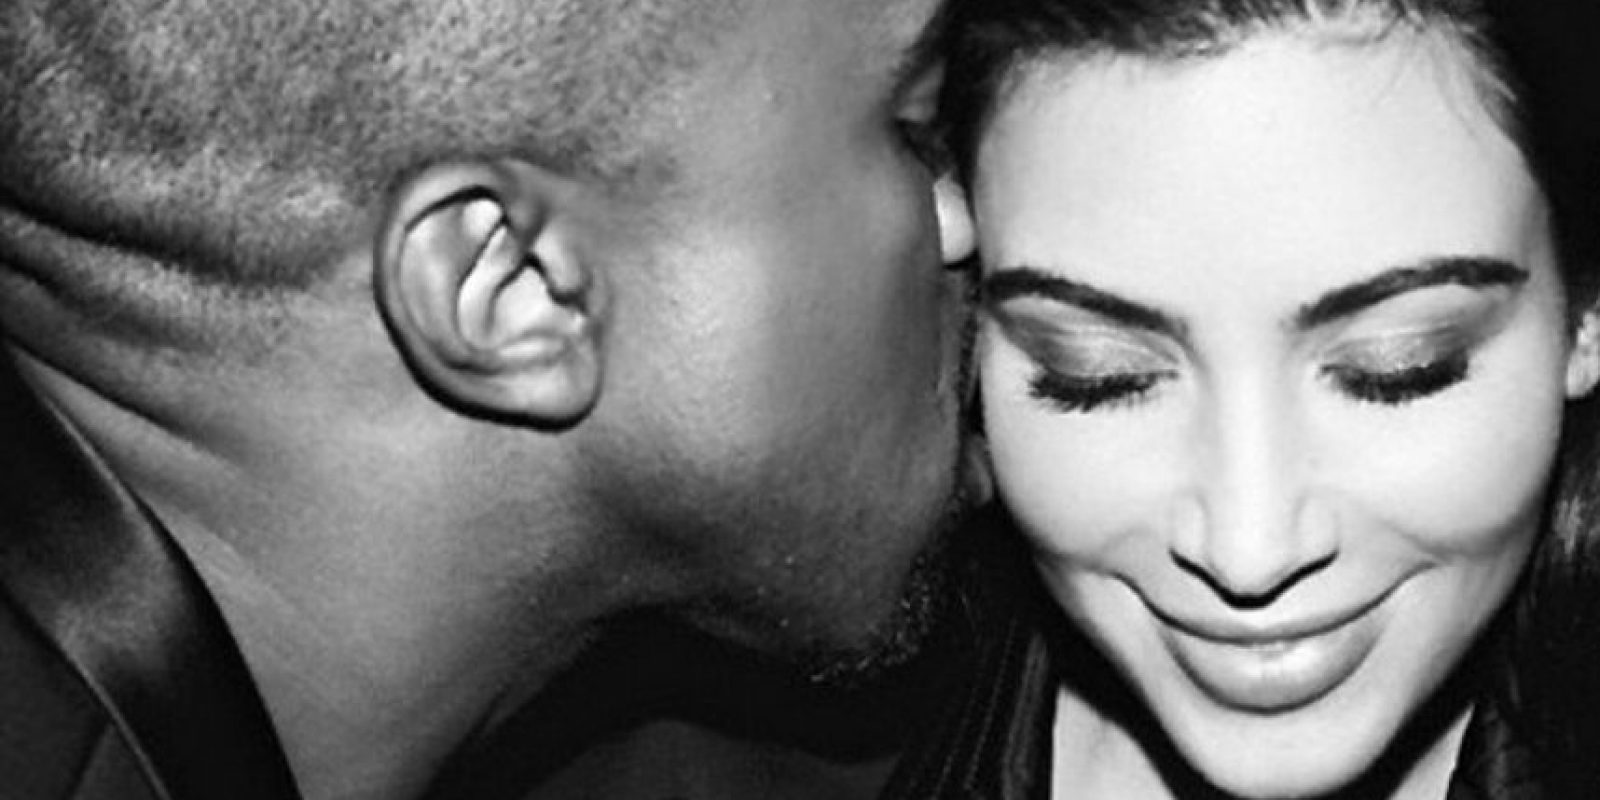 Si hizo otra idiotez con Kanye West. Foto:vía Instagram/KimKardashian